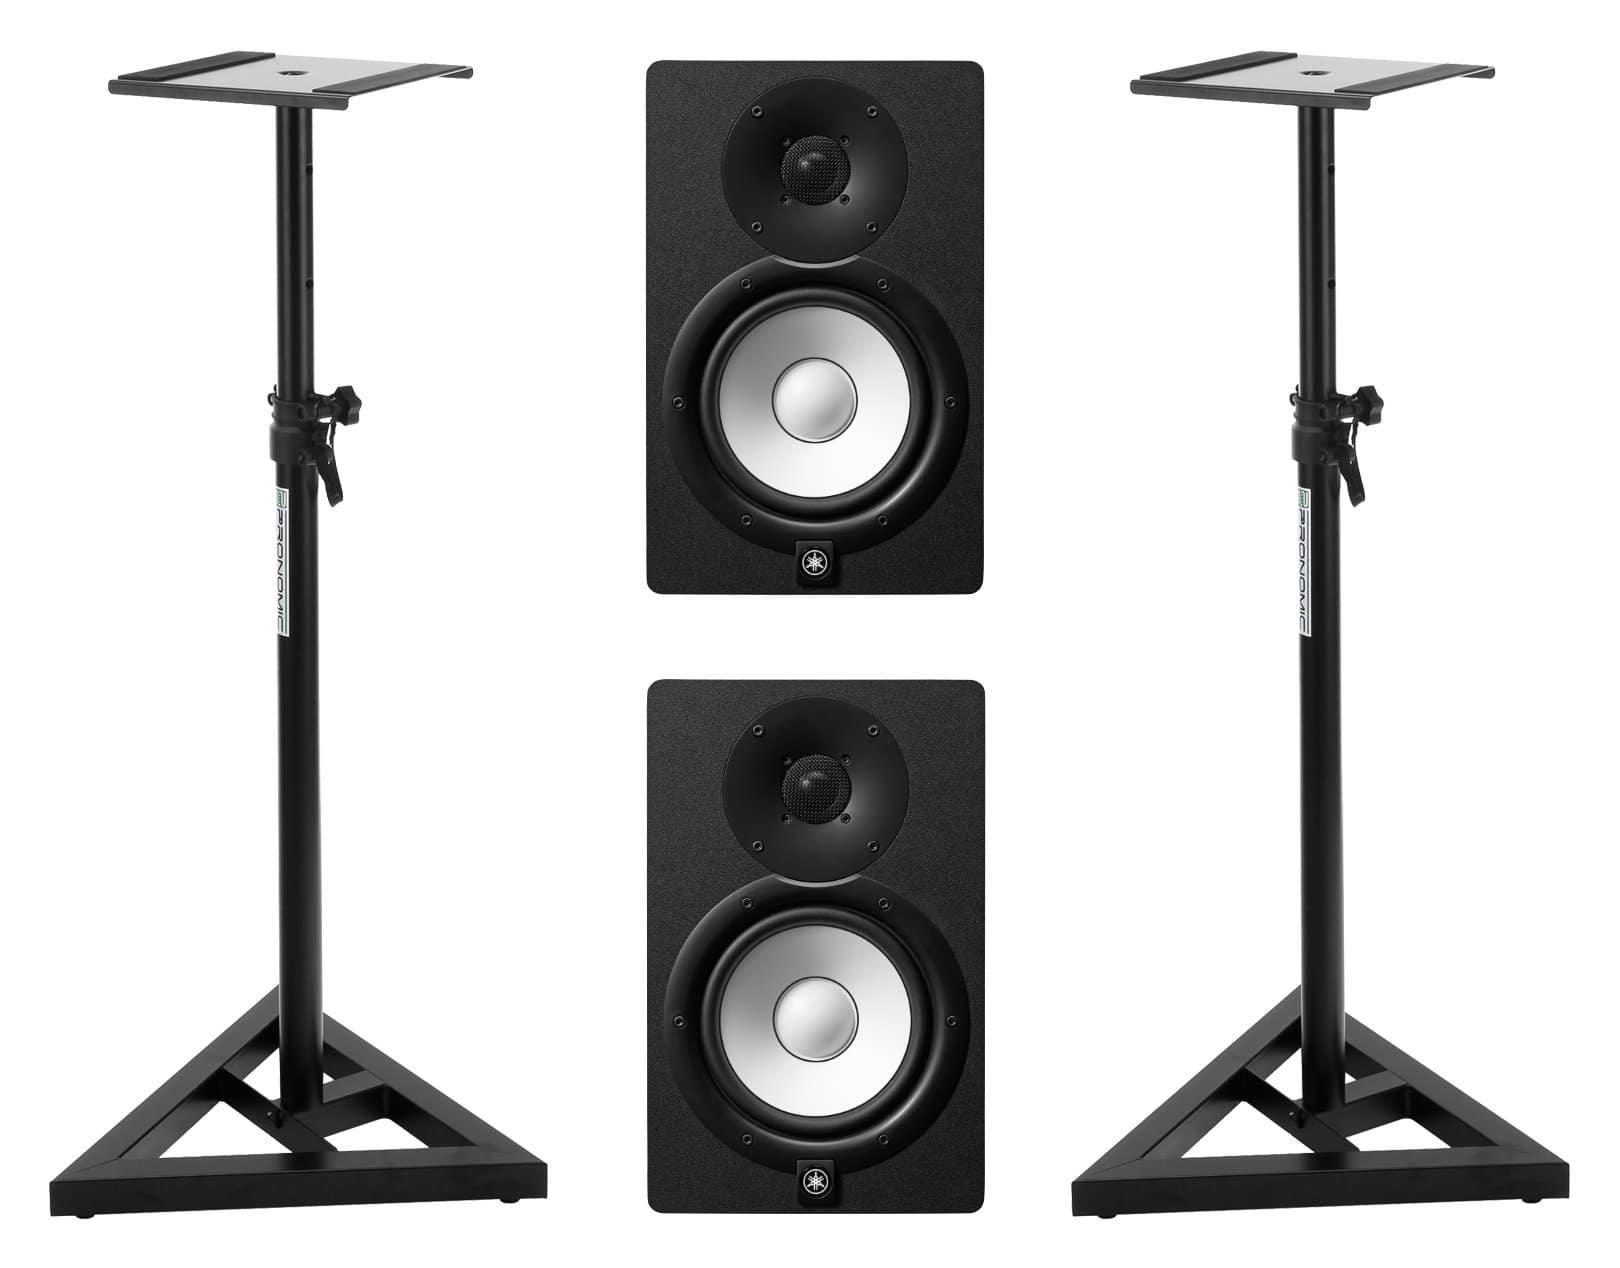 Studiomonitore - Yamaha HS7 MP Stativ Set - Onlineshop Musikhaus Kirstein